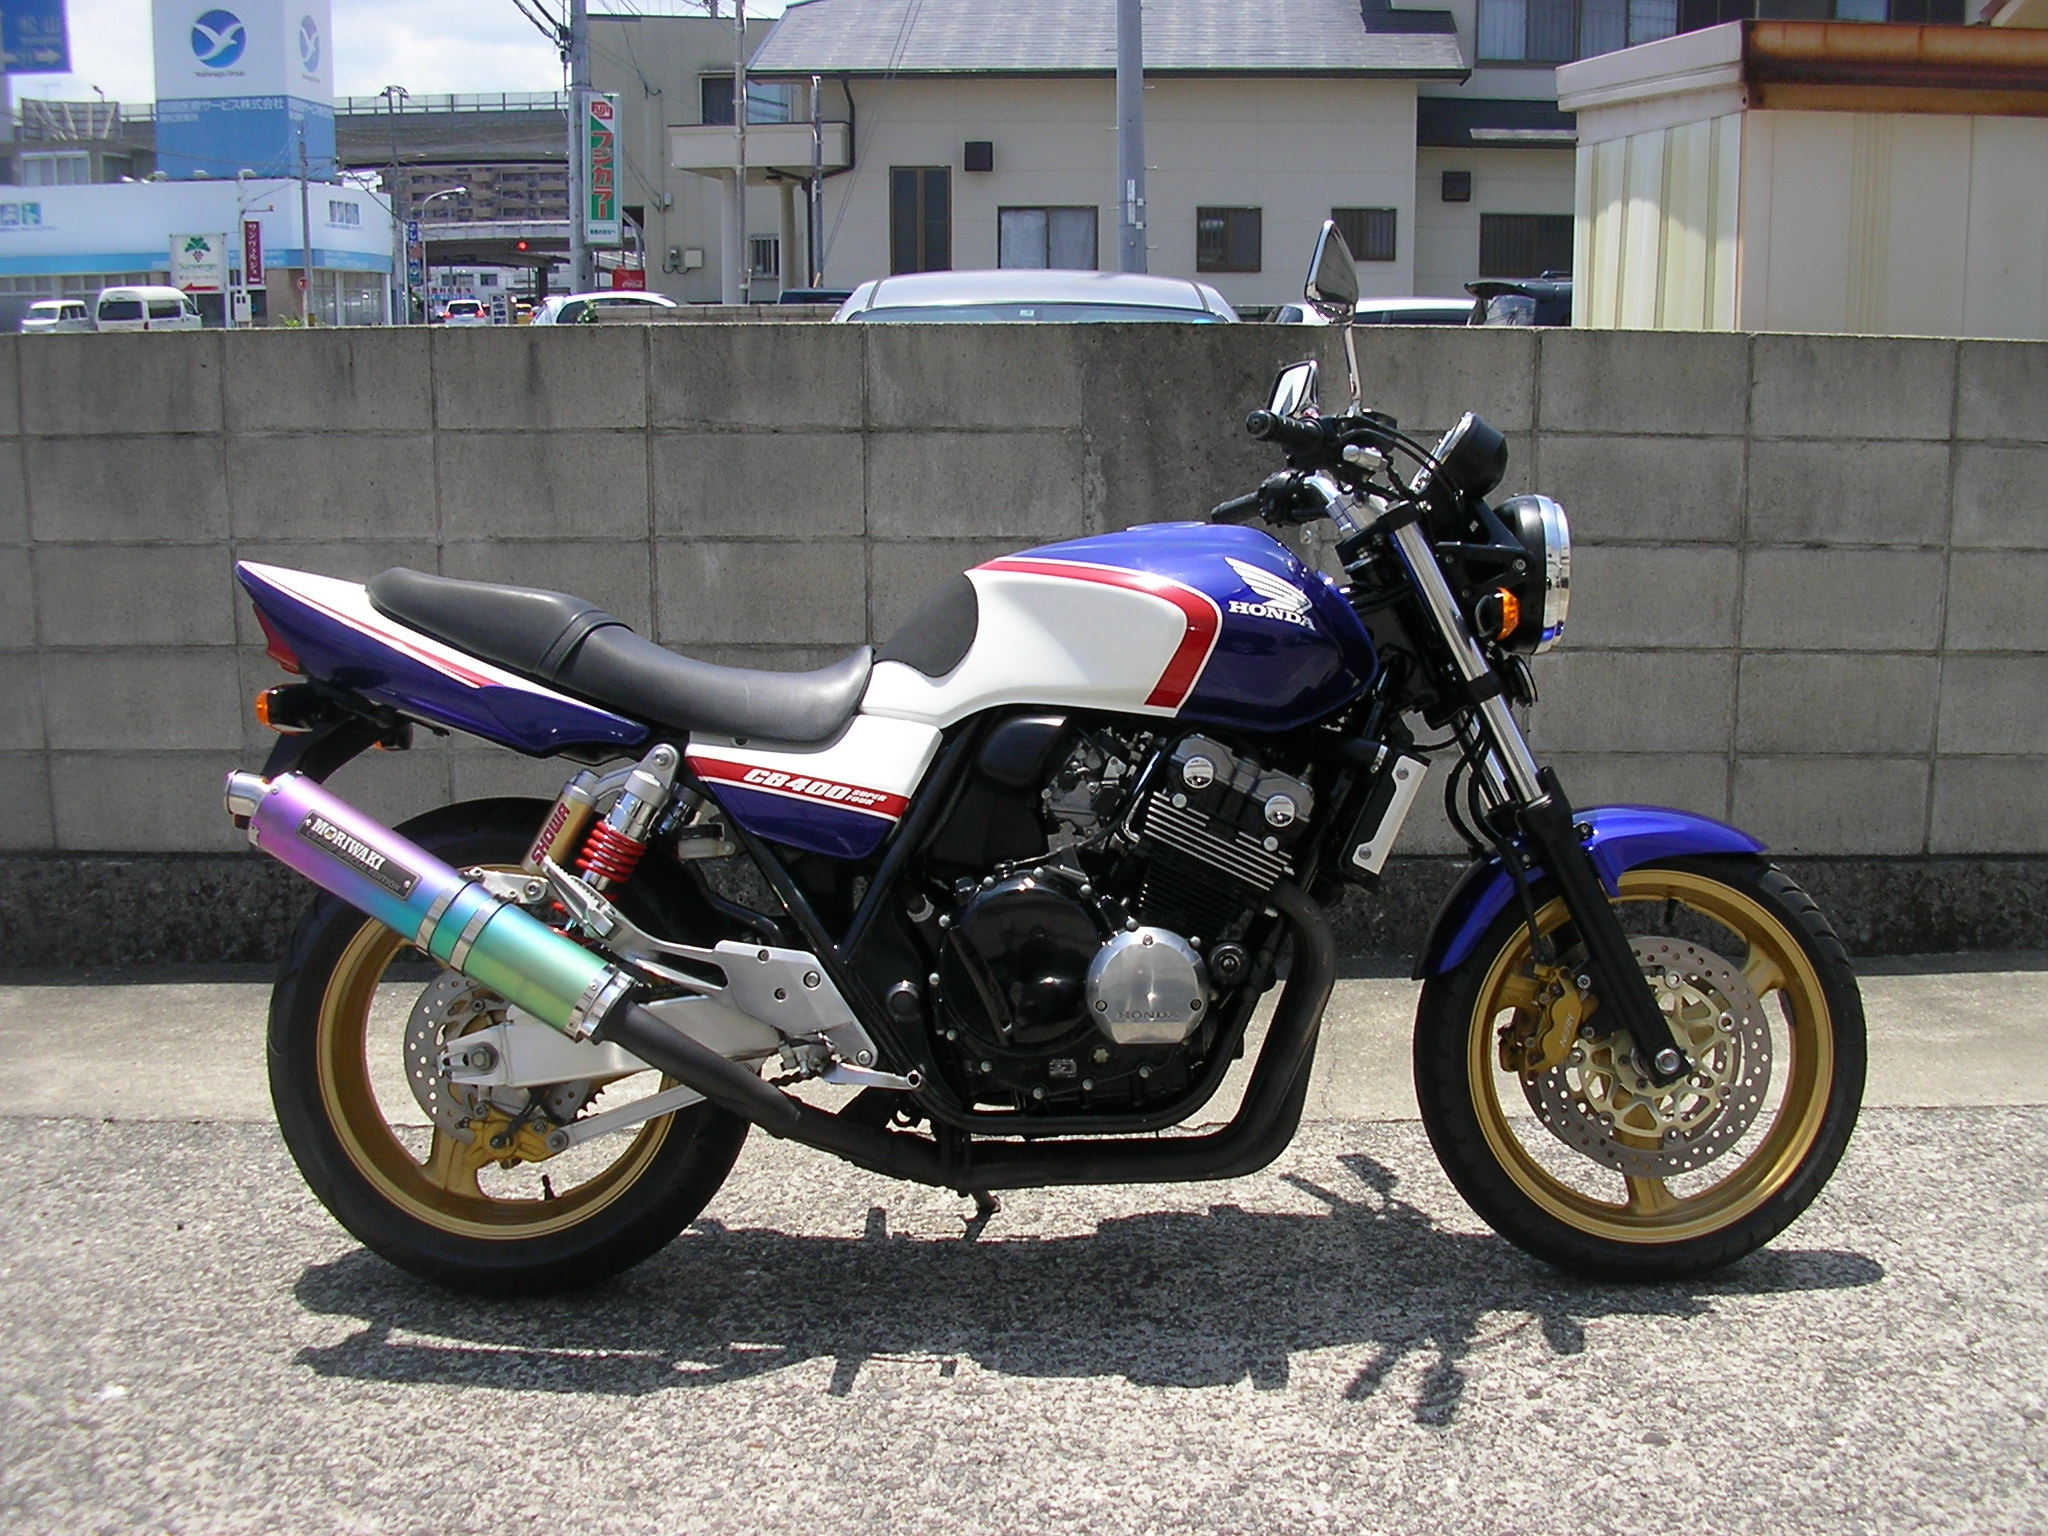 CB400SF VTEC2 (FC-000) - 【公式】レンタルバイクのベストBike® JR茨木駅前